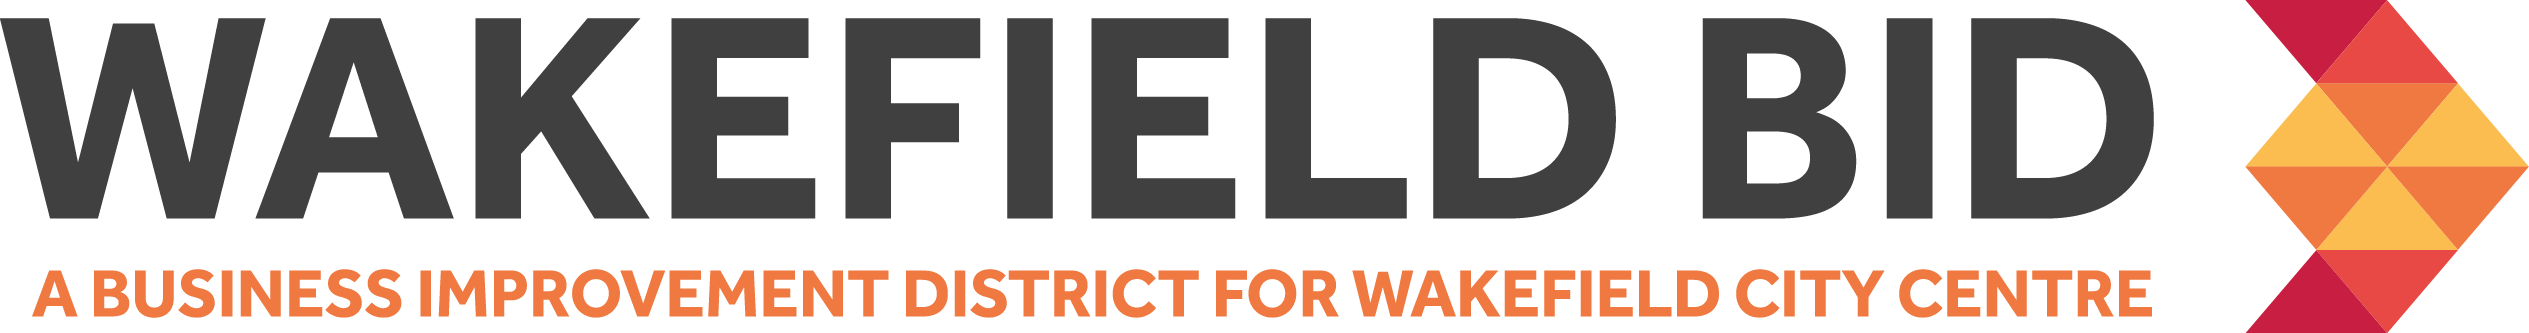 Wakefield BID Logo